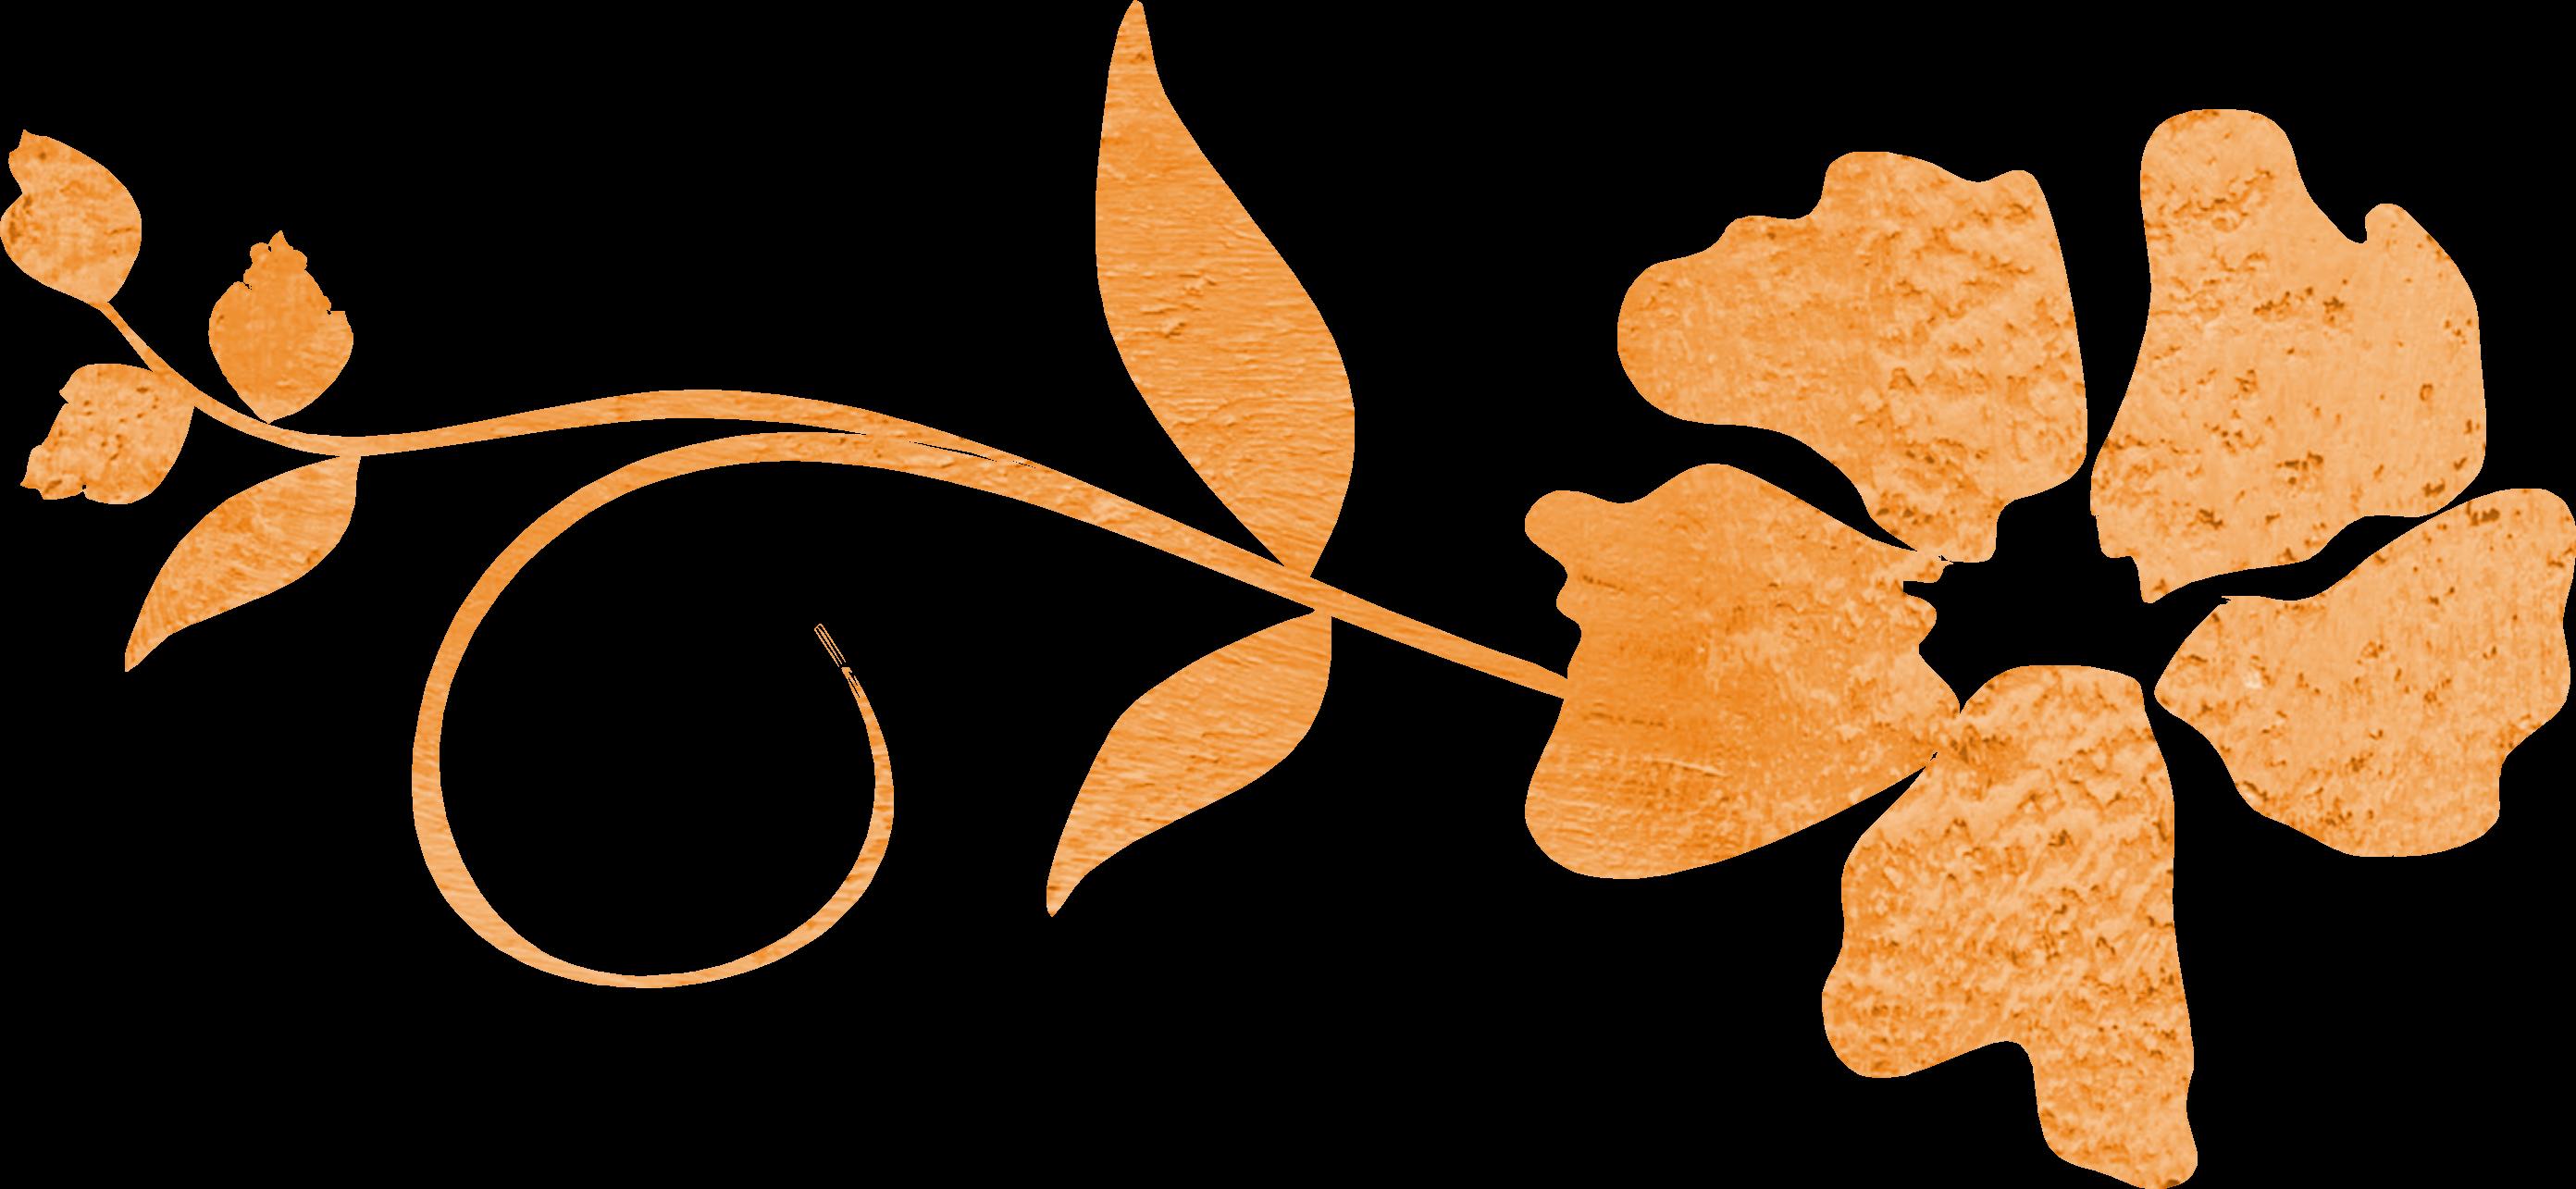 Flower swirls clipart png Flower Swirl Vector Orange free image png